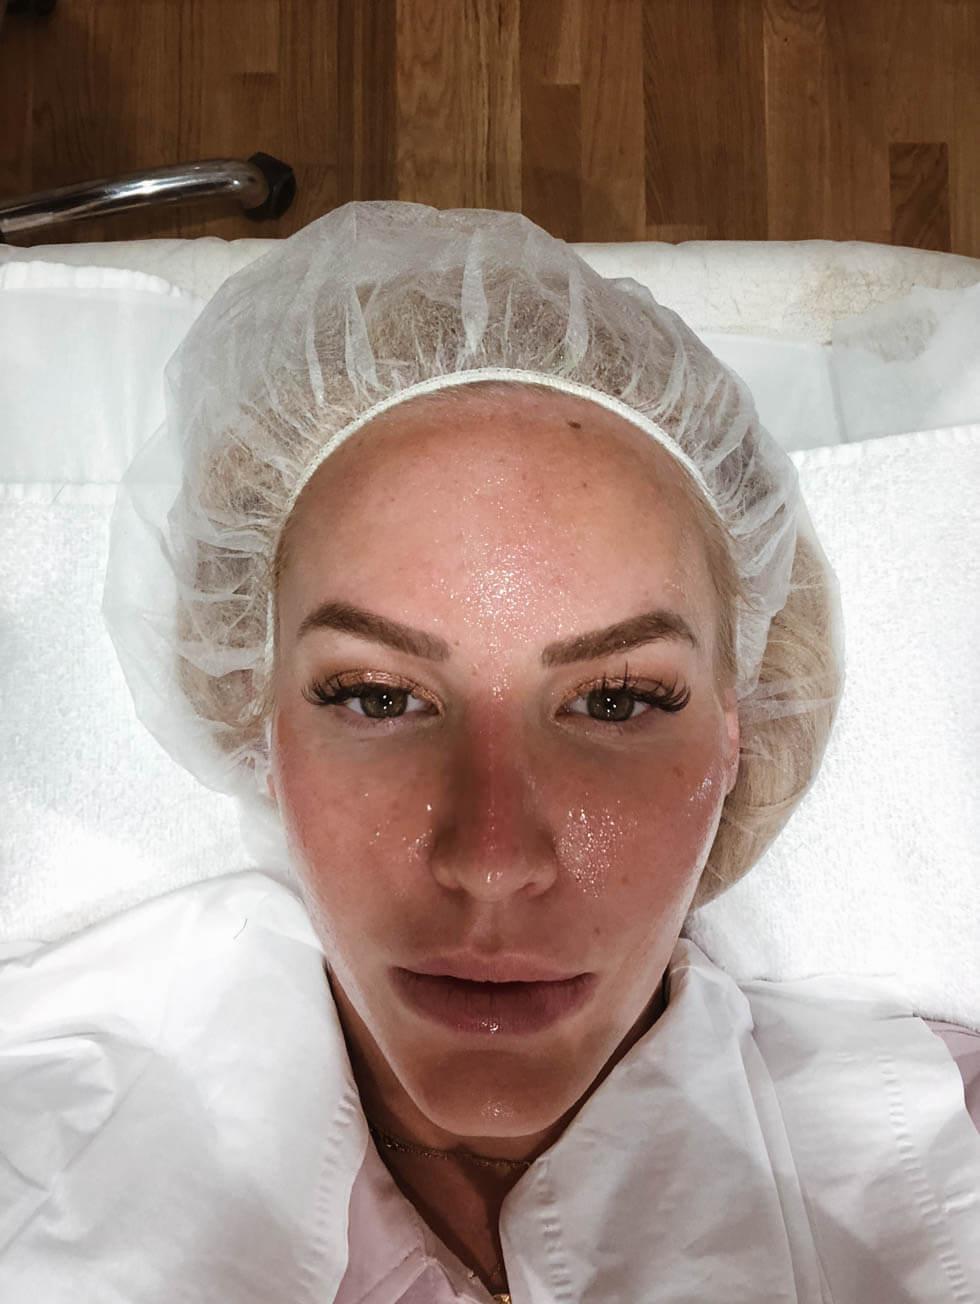 Microdermabrasion- Finslipa huden, damsug och bli kvitt grova porer._-11